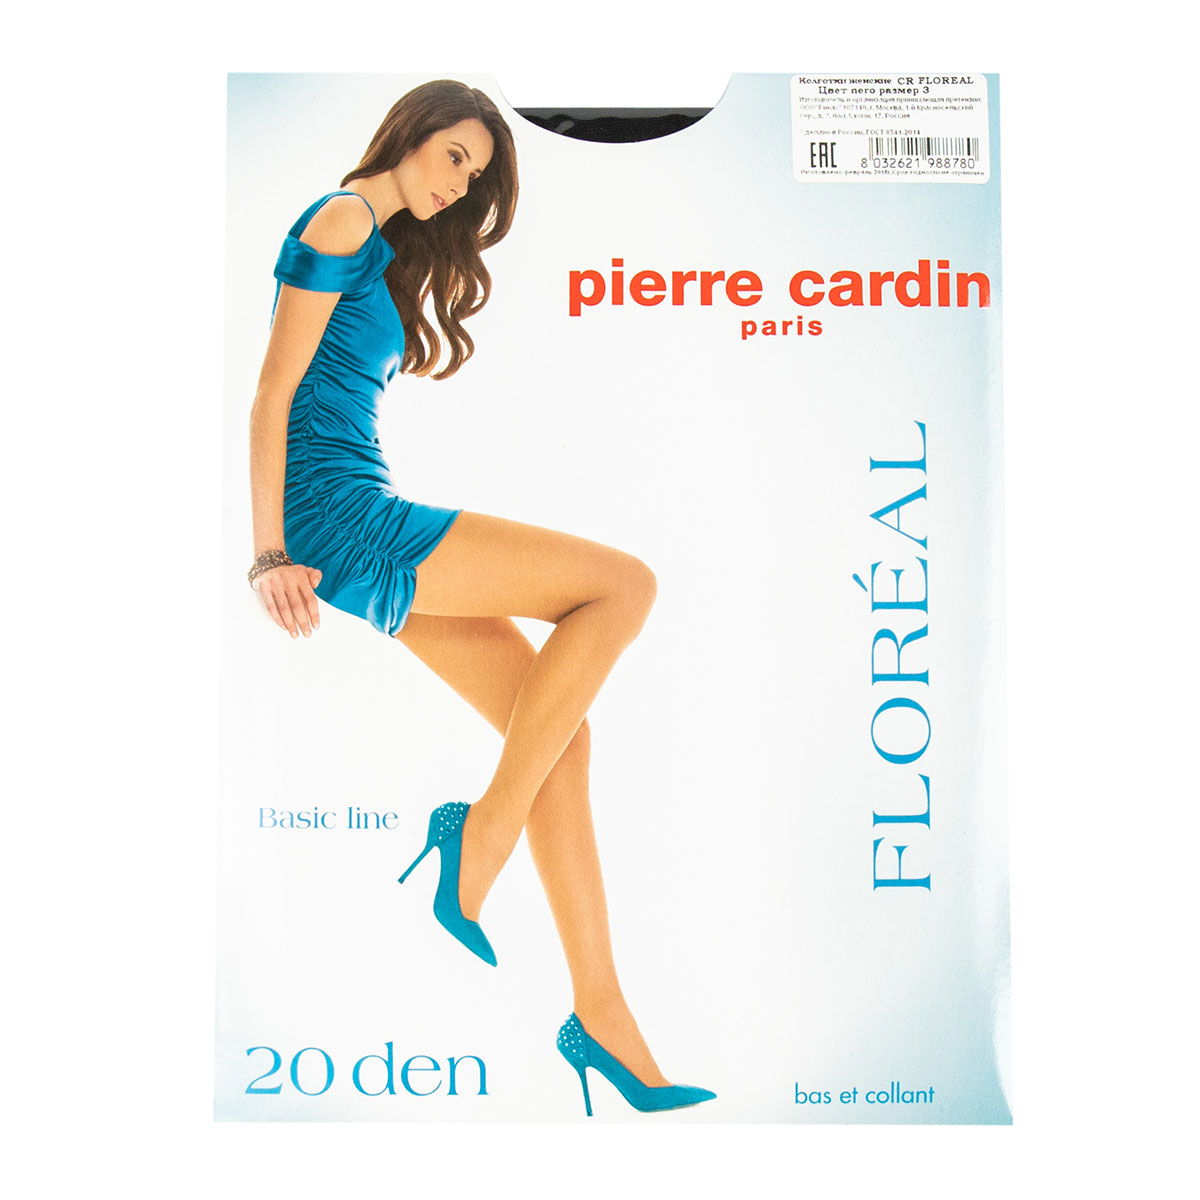 Pierre Cardin Floreal Nero 3 20 den